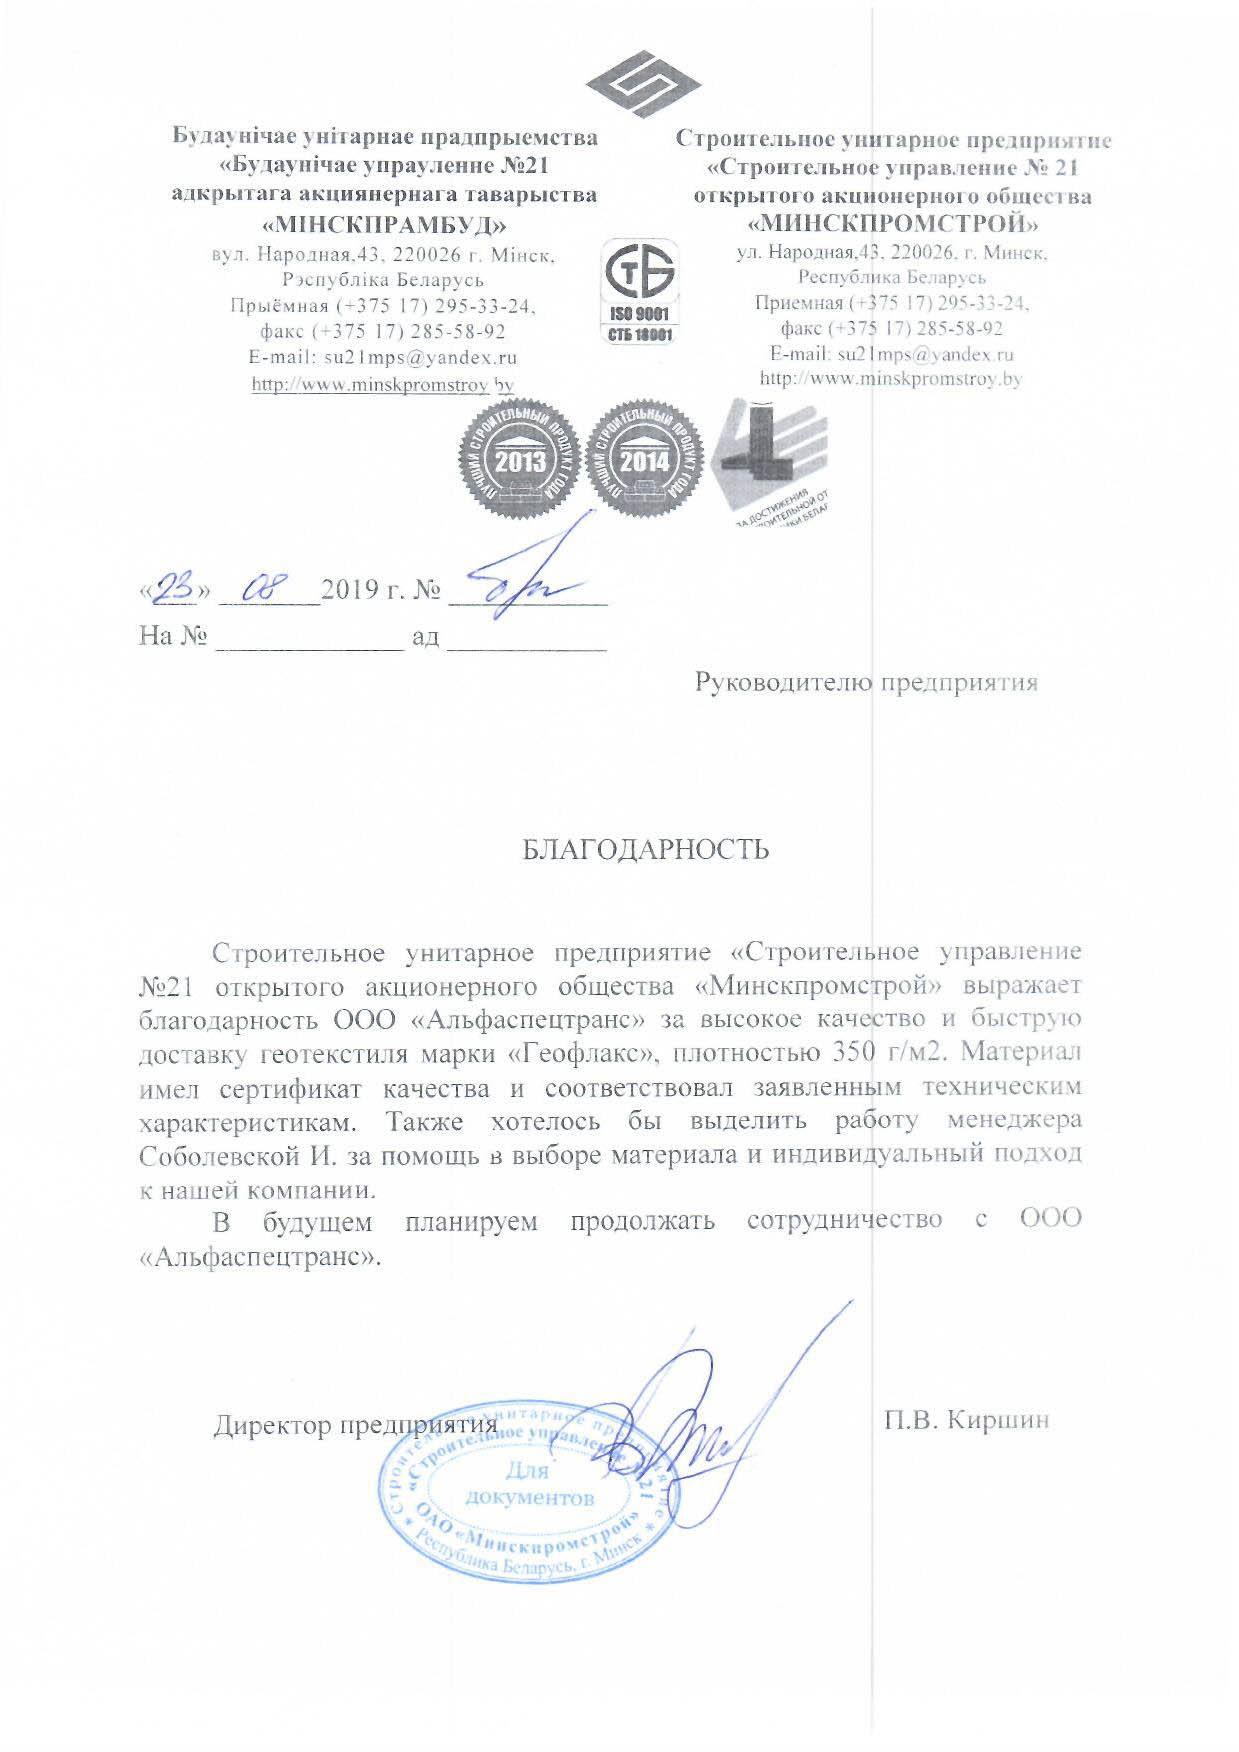 СУ-21 Минскпромстрой